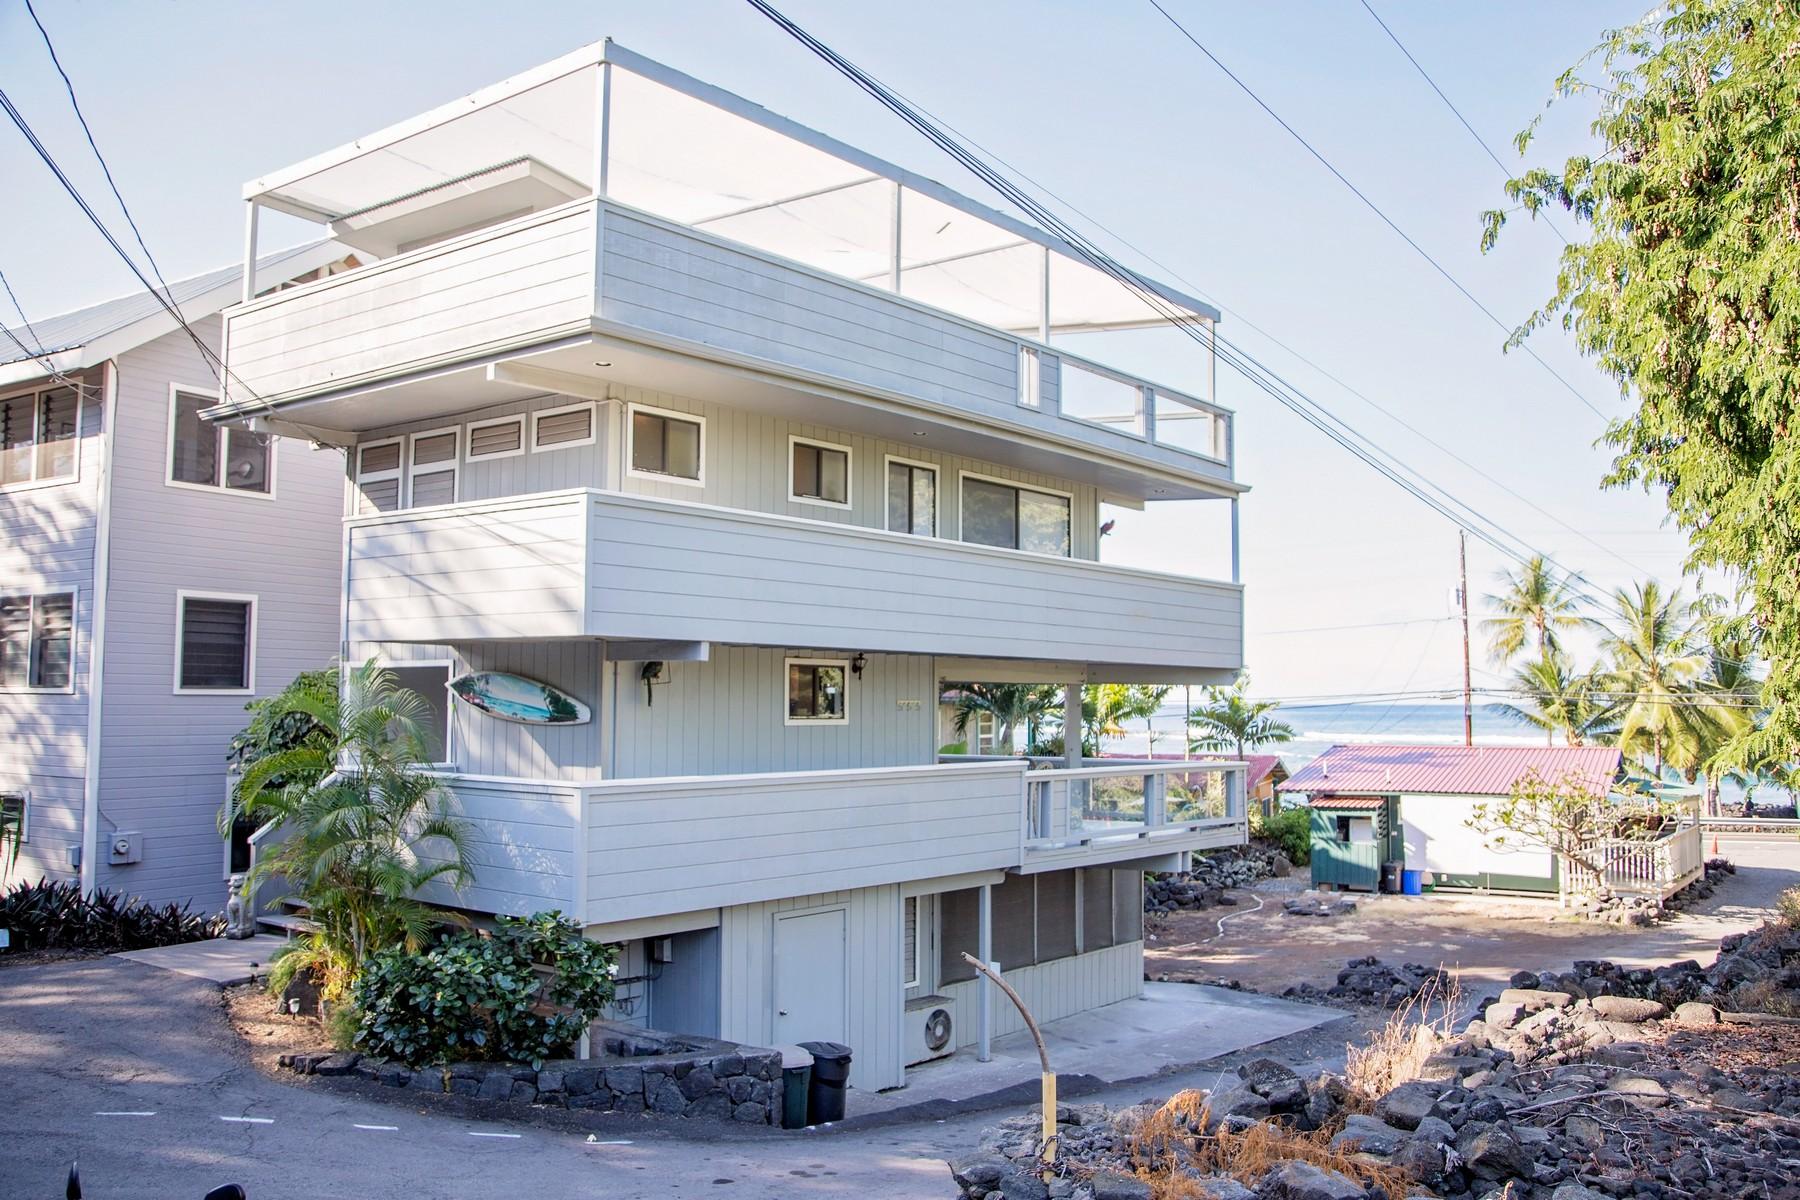 Condomínio para Venda às Kahaluu Beach Lots 78-208 Kahaluu Road, Kailua, Havaí, 96740 Estados Unidos